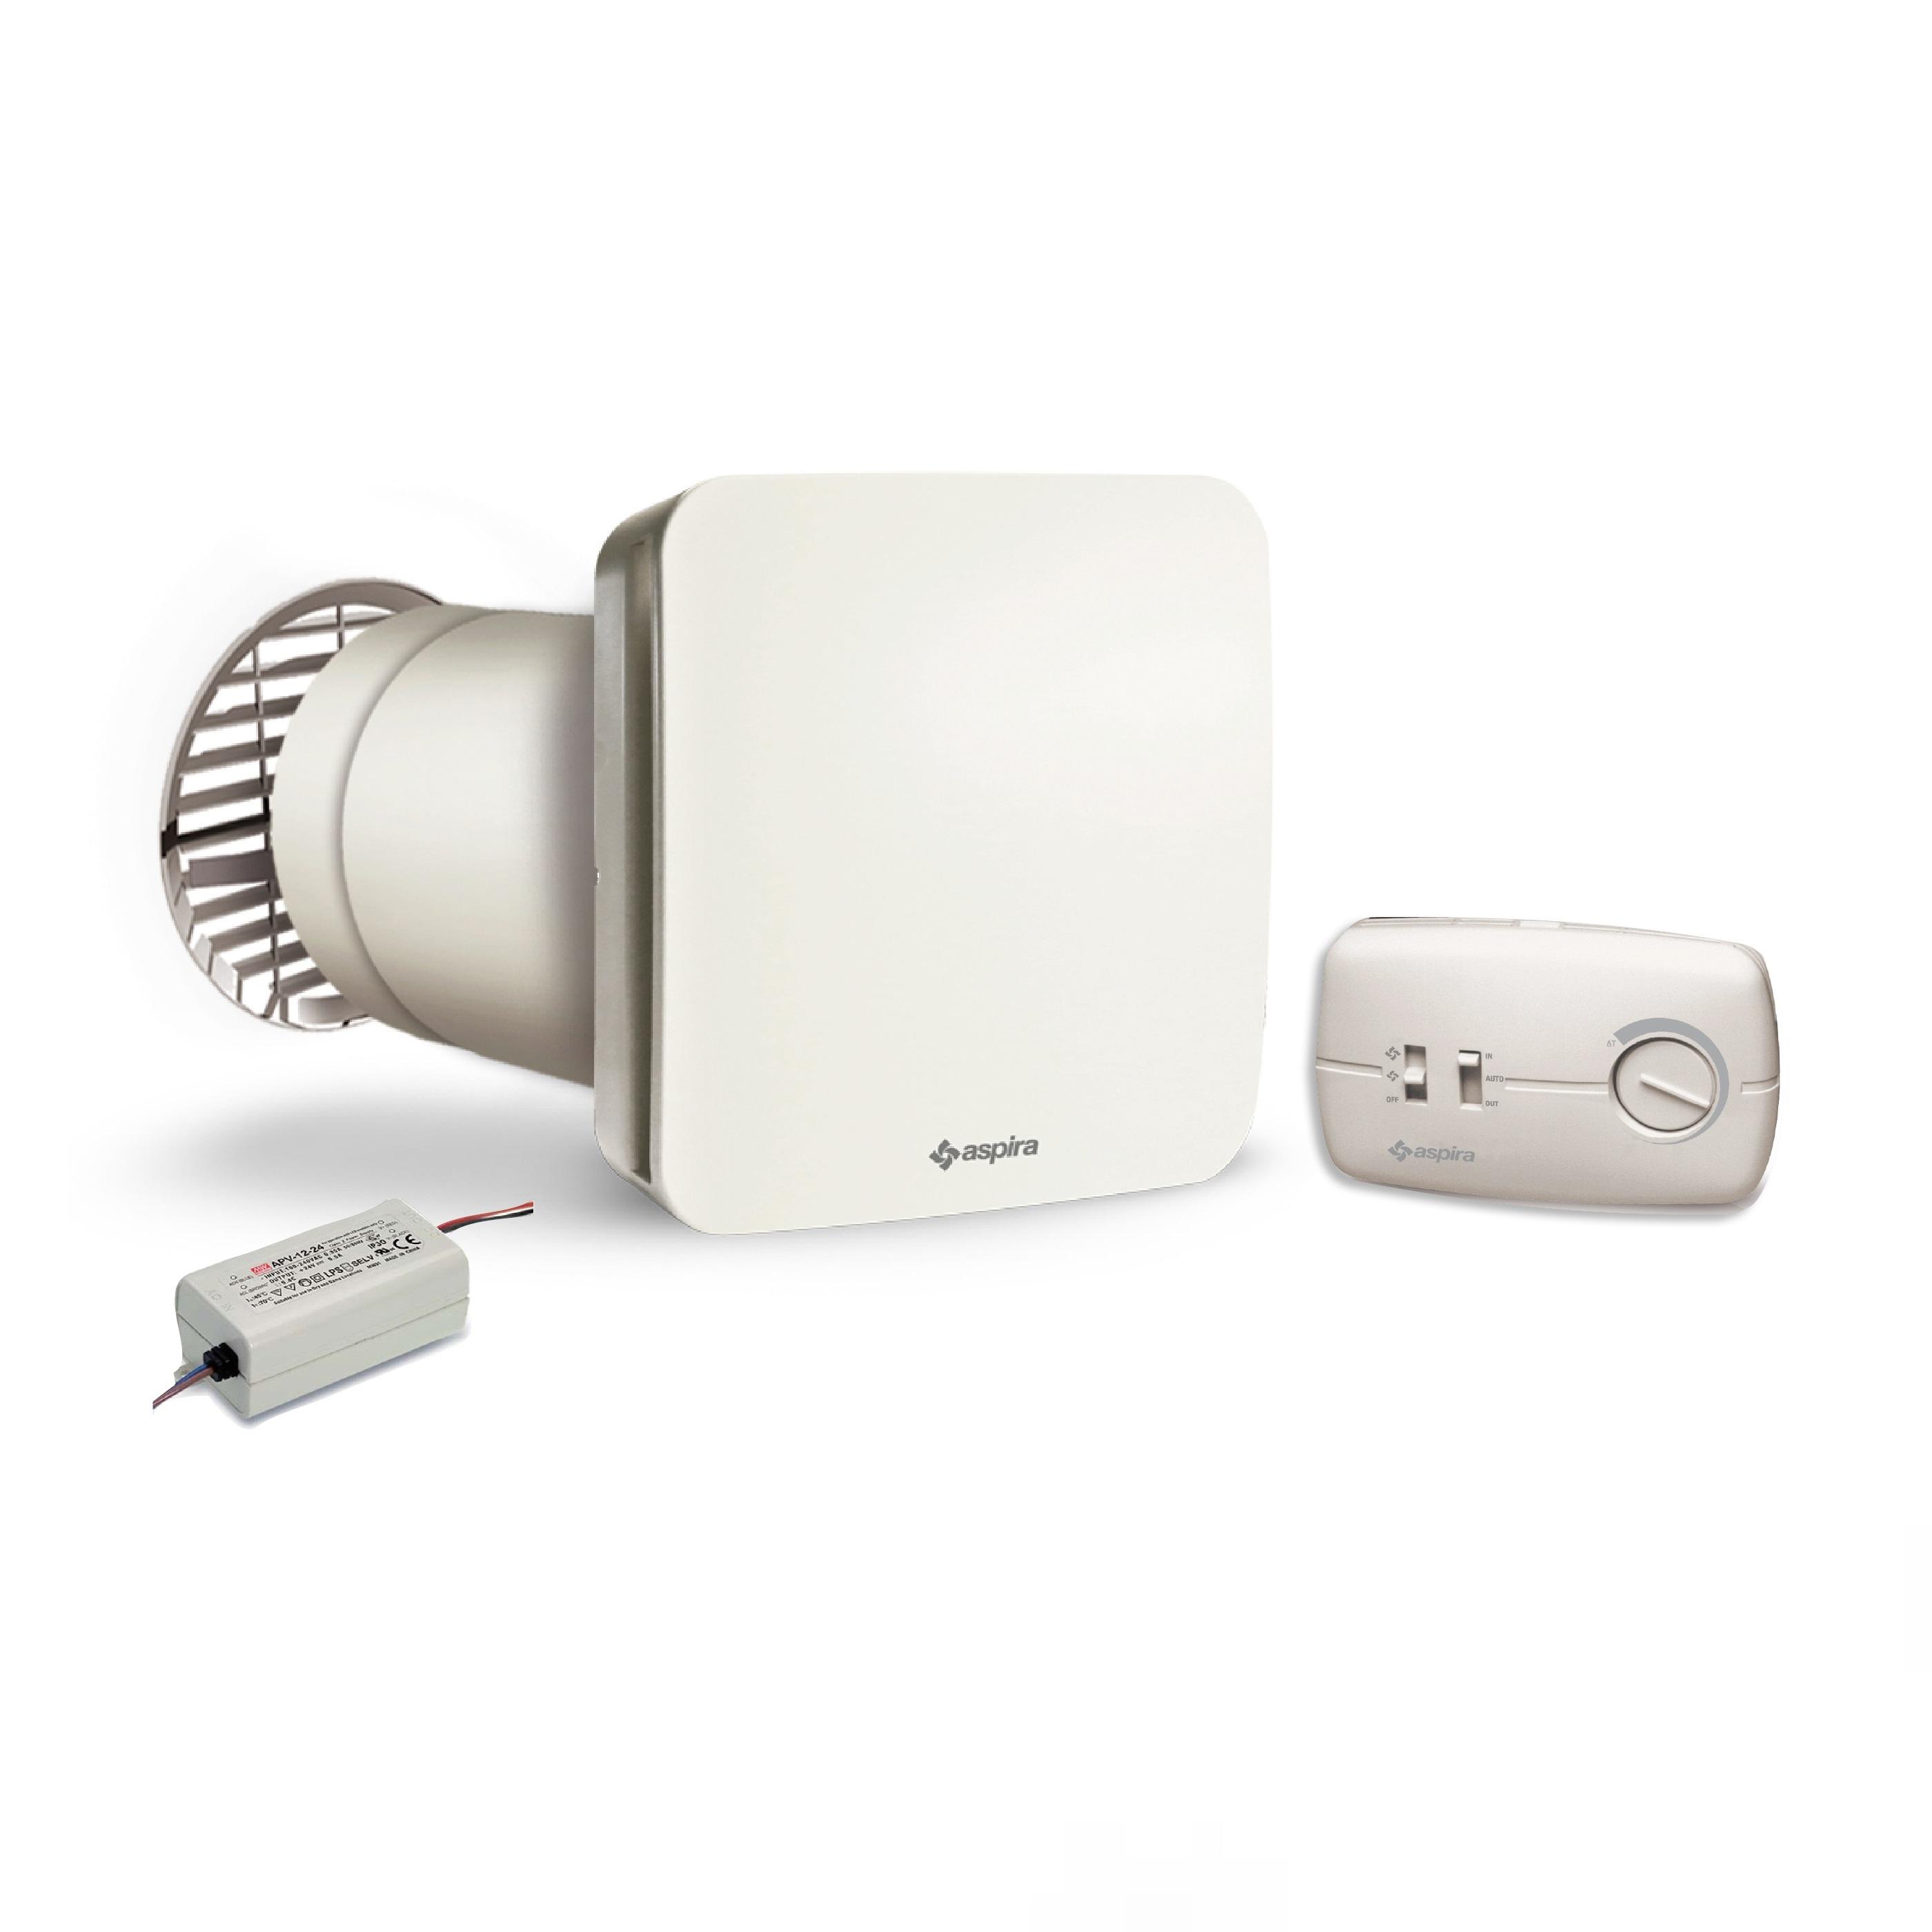 Unitate Aspira EcoComfort 160, Ventilatie cu recuperare de caldura, 2 Trepte de viteza, Acoperire 50 mp imagine case-smart.ro 2021